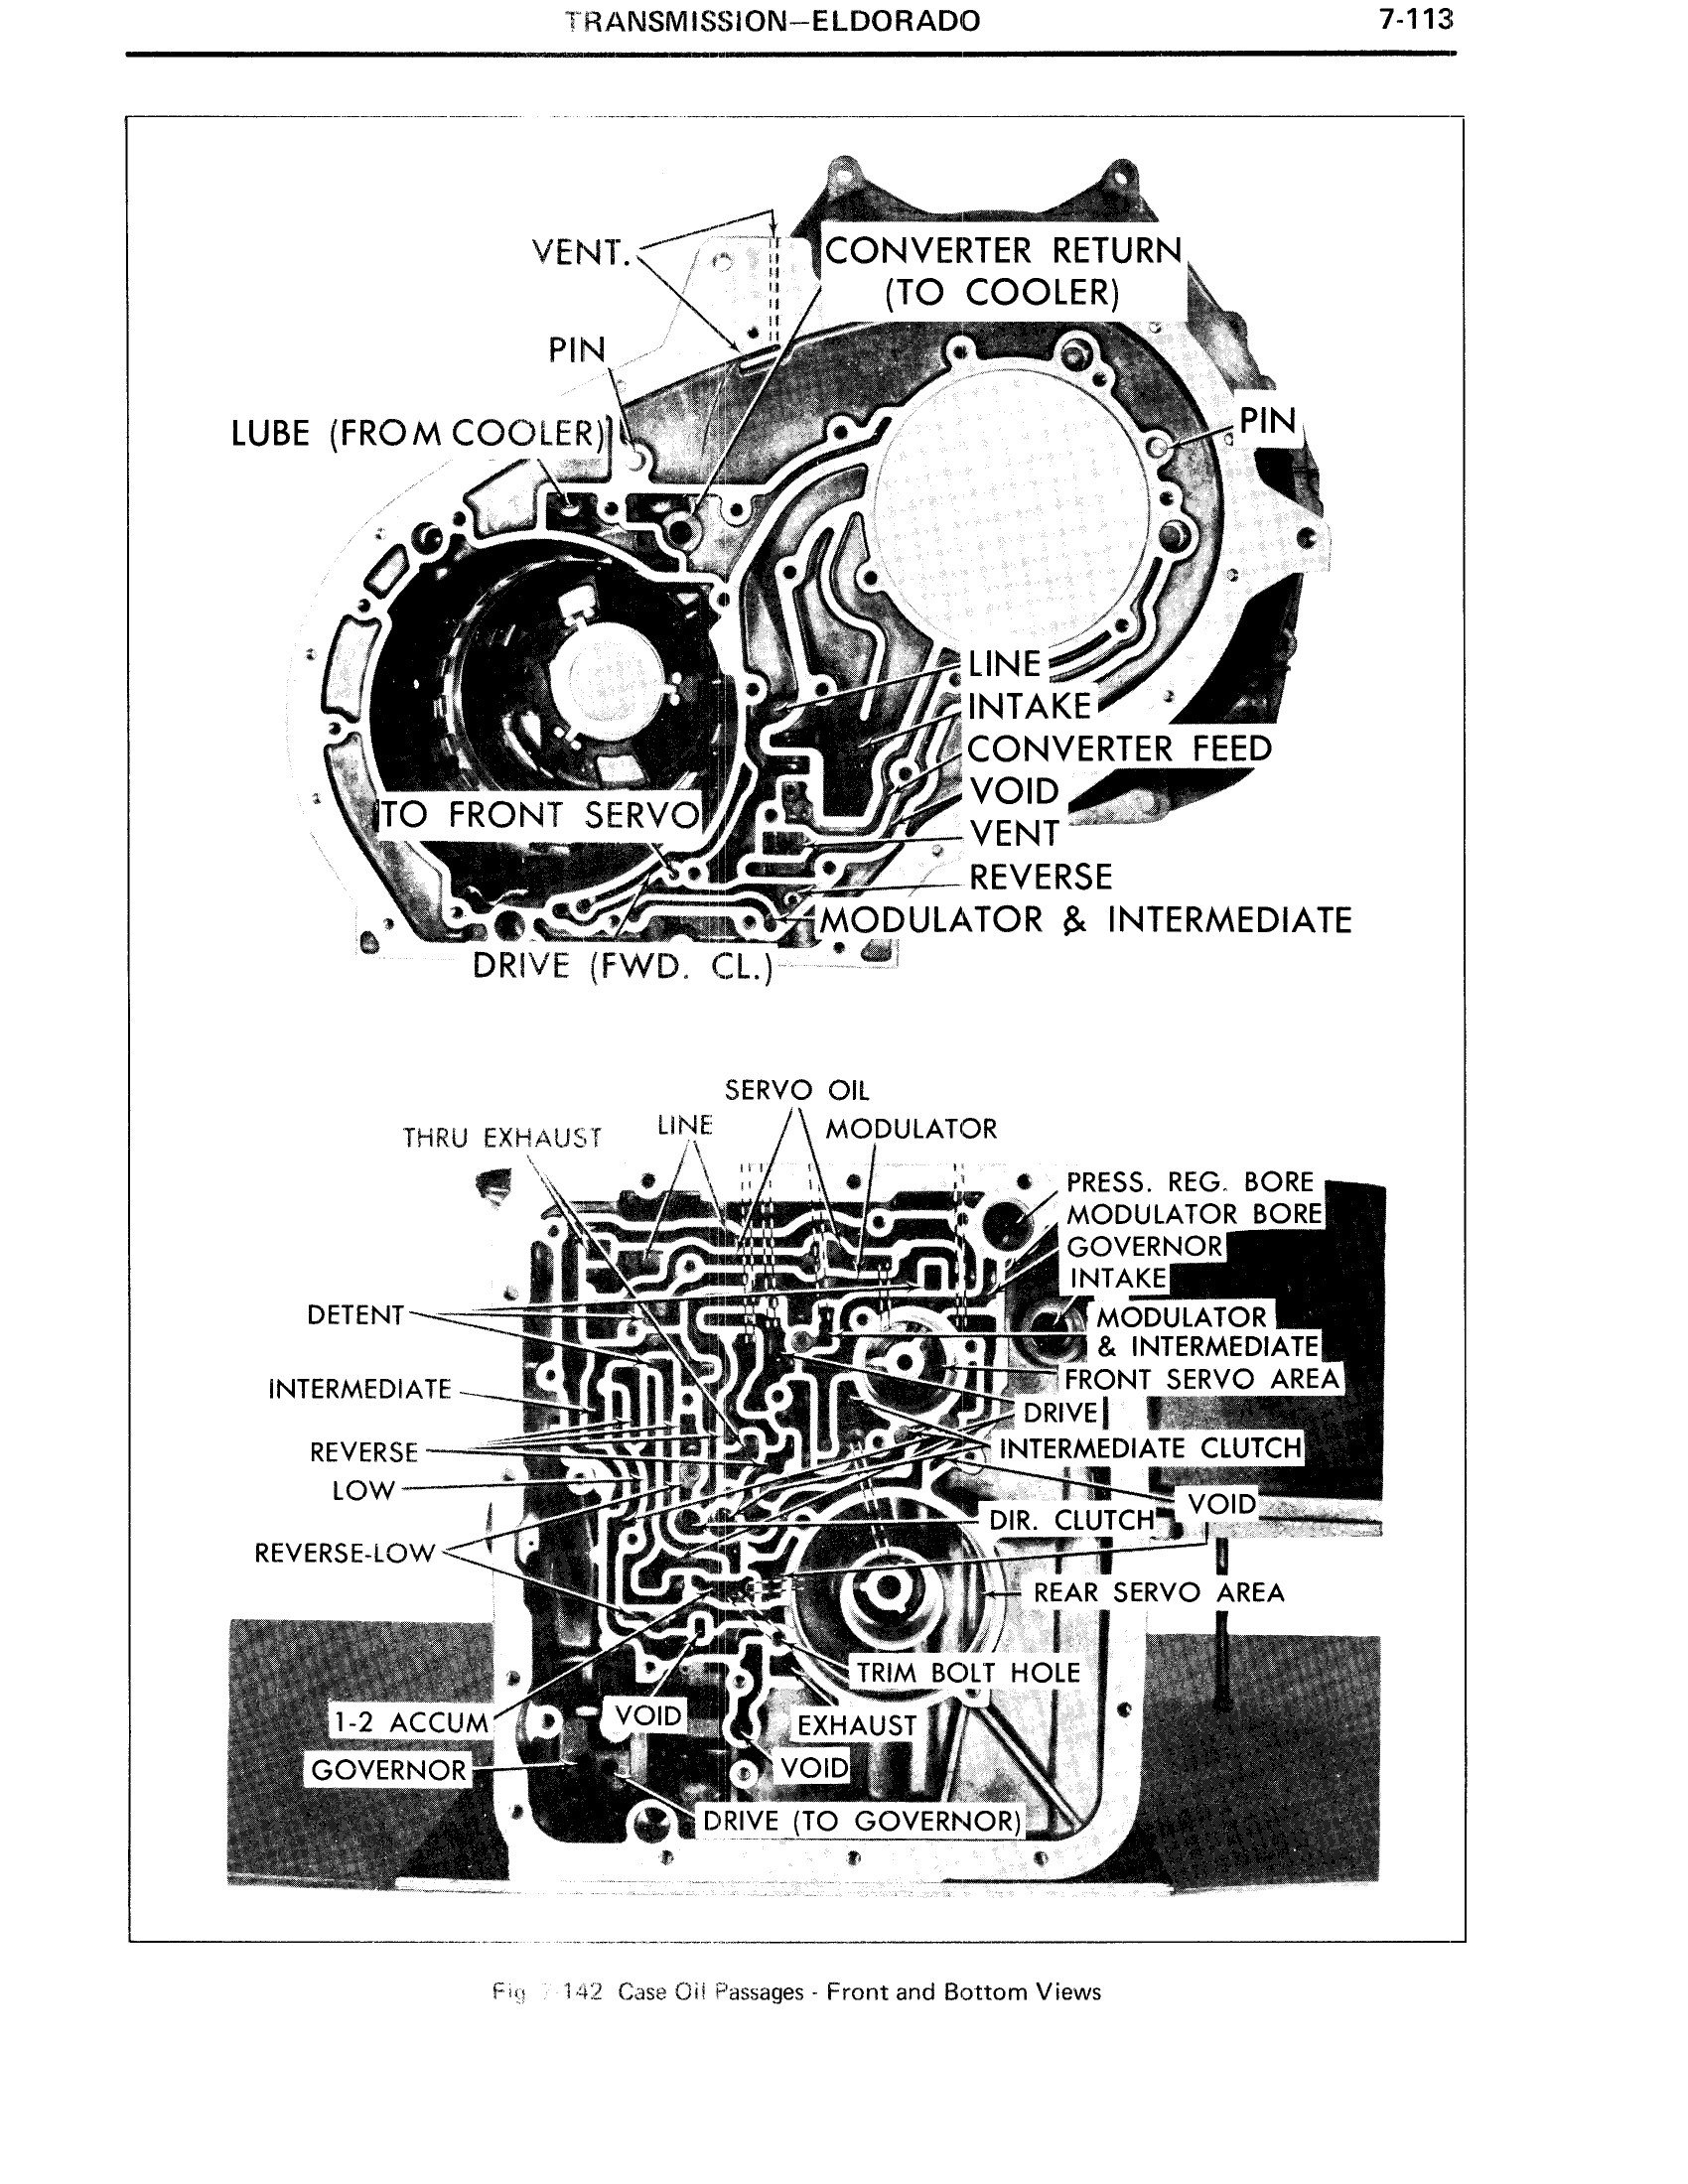 1971 Cadillac Shop Manual- Transmission Page 113 of 156